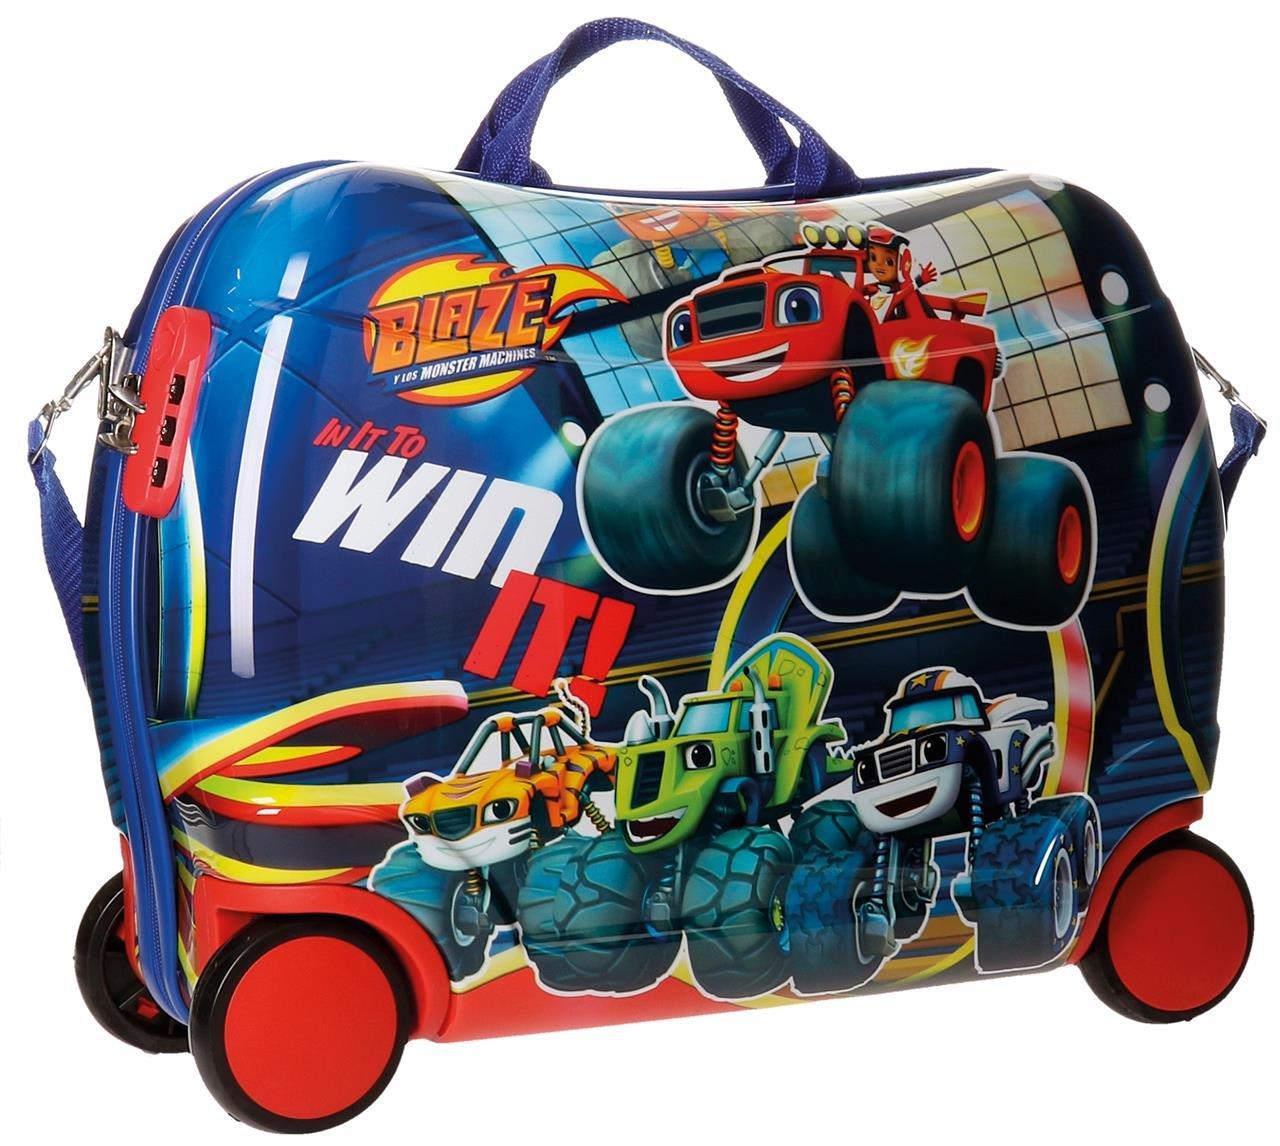 Blaze Blaze Kindergepäck, 50 cm, 34 liters, Mehrfarbig (Multicolor)